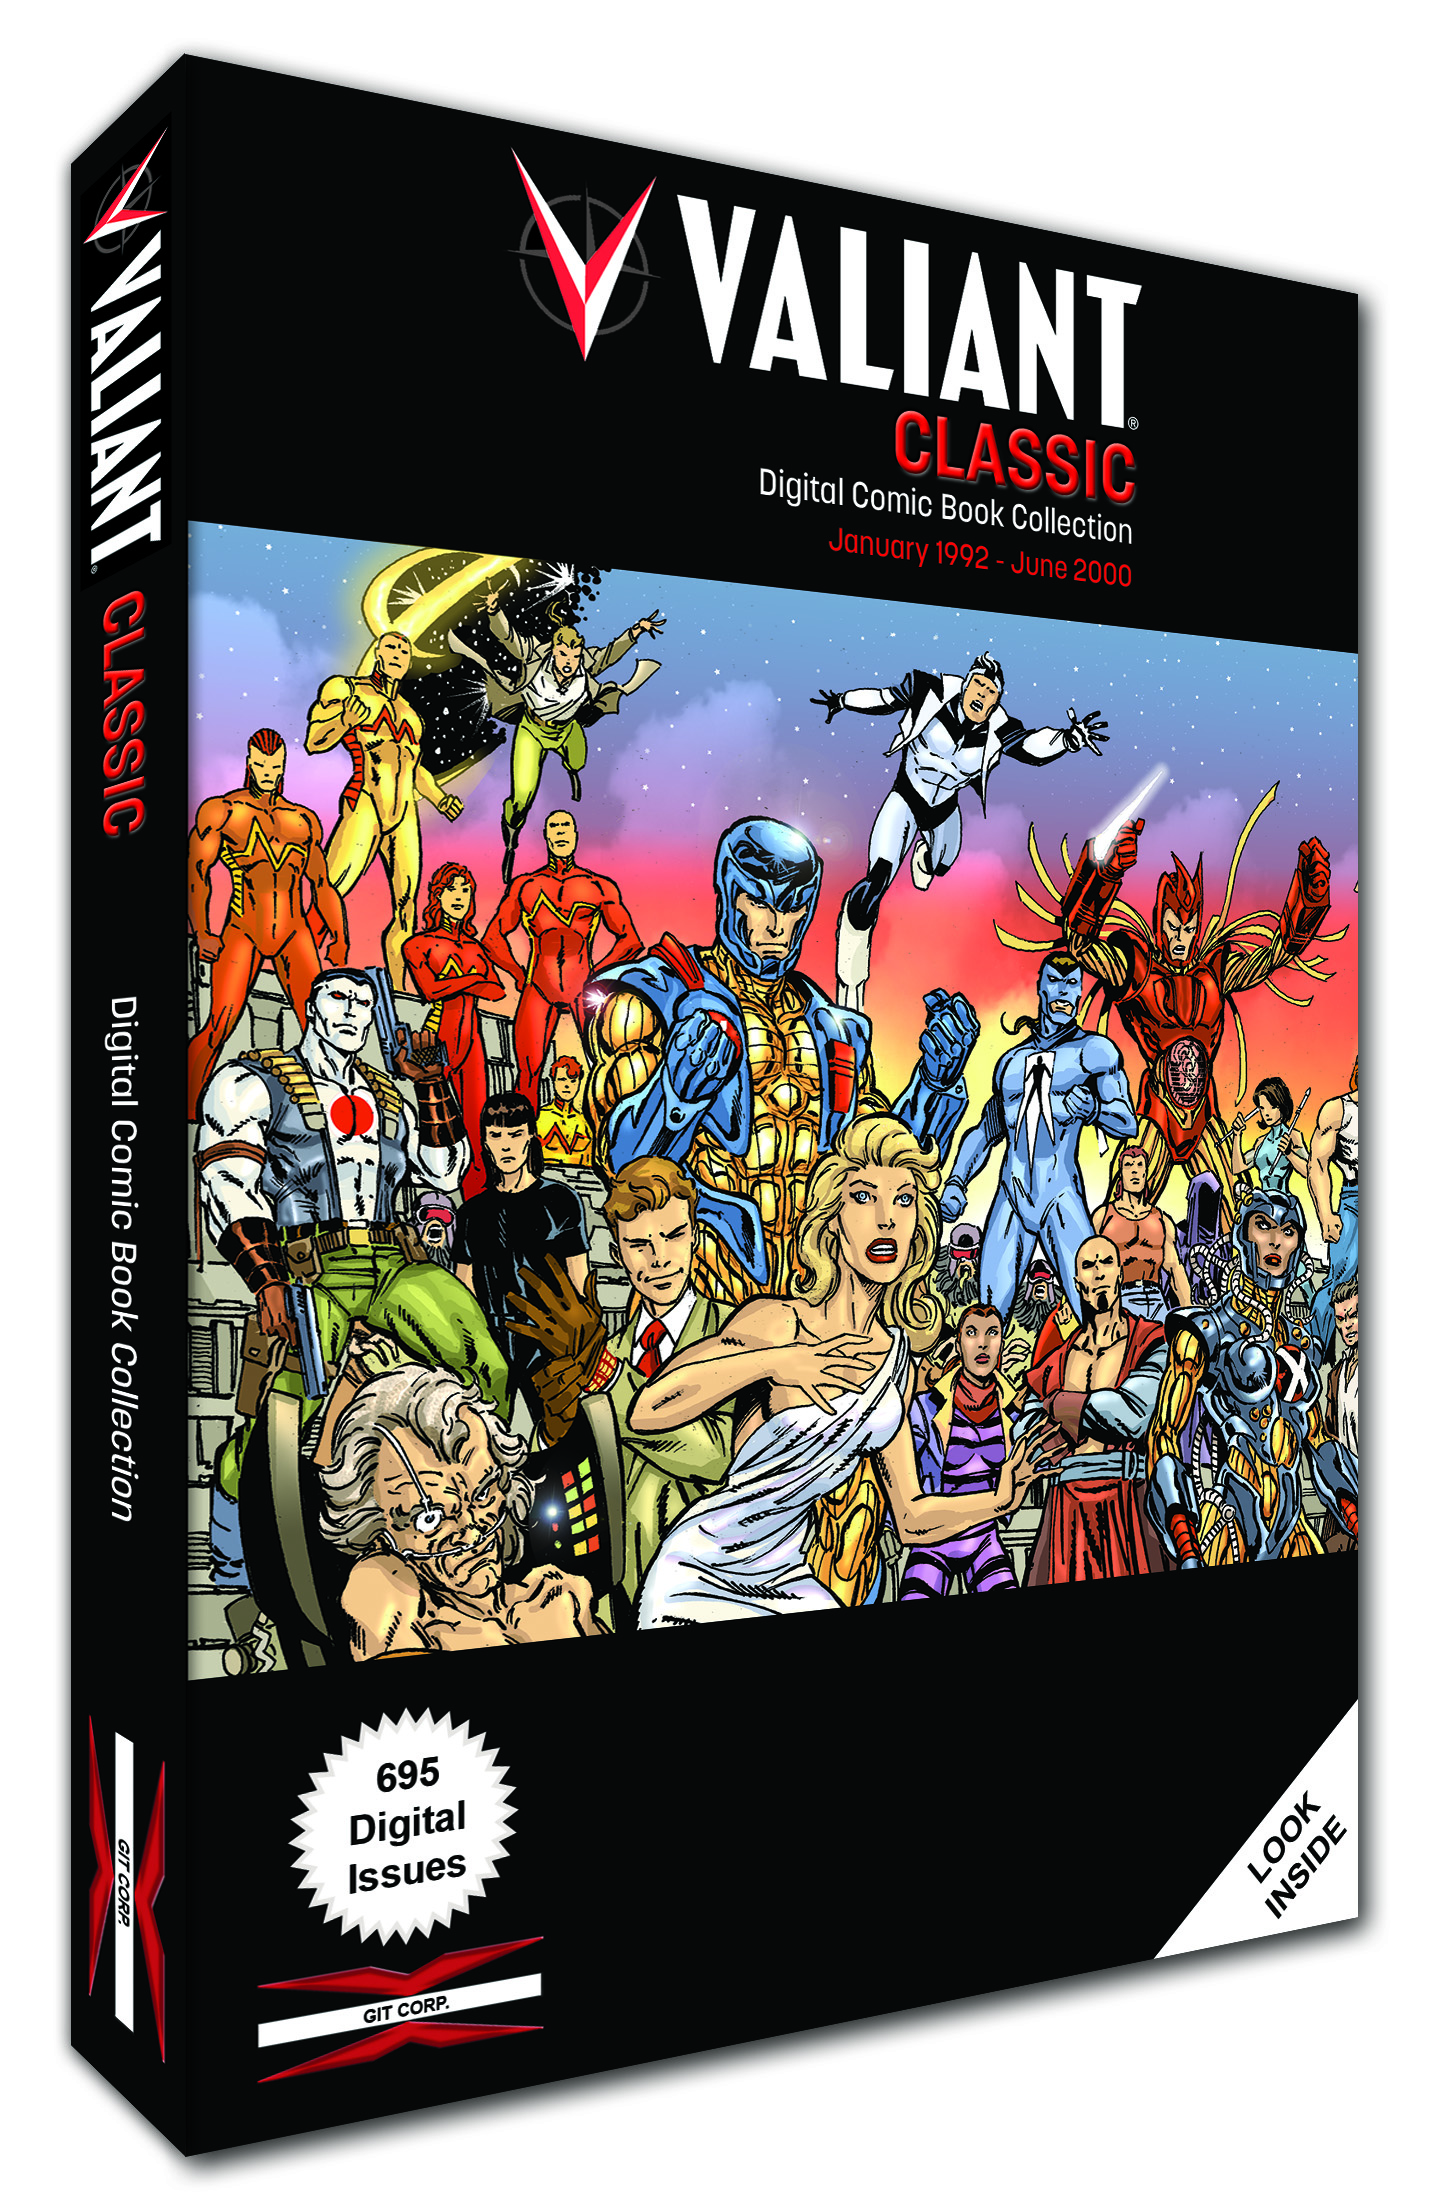 VALIANT CLASSIC_3D BOX.jpg